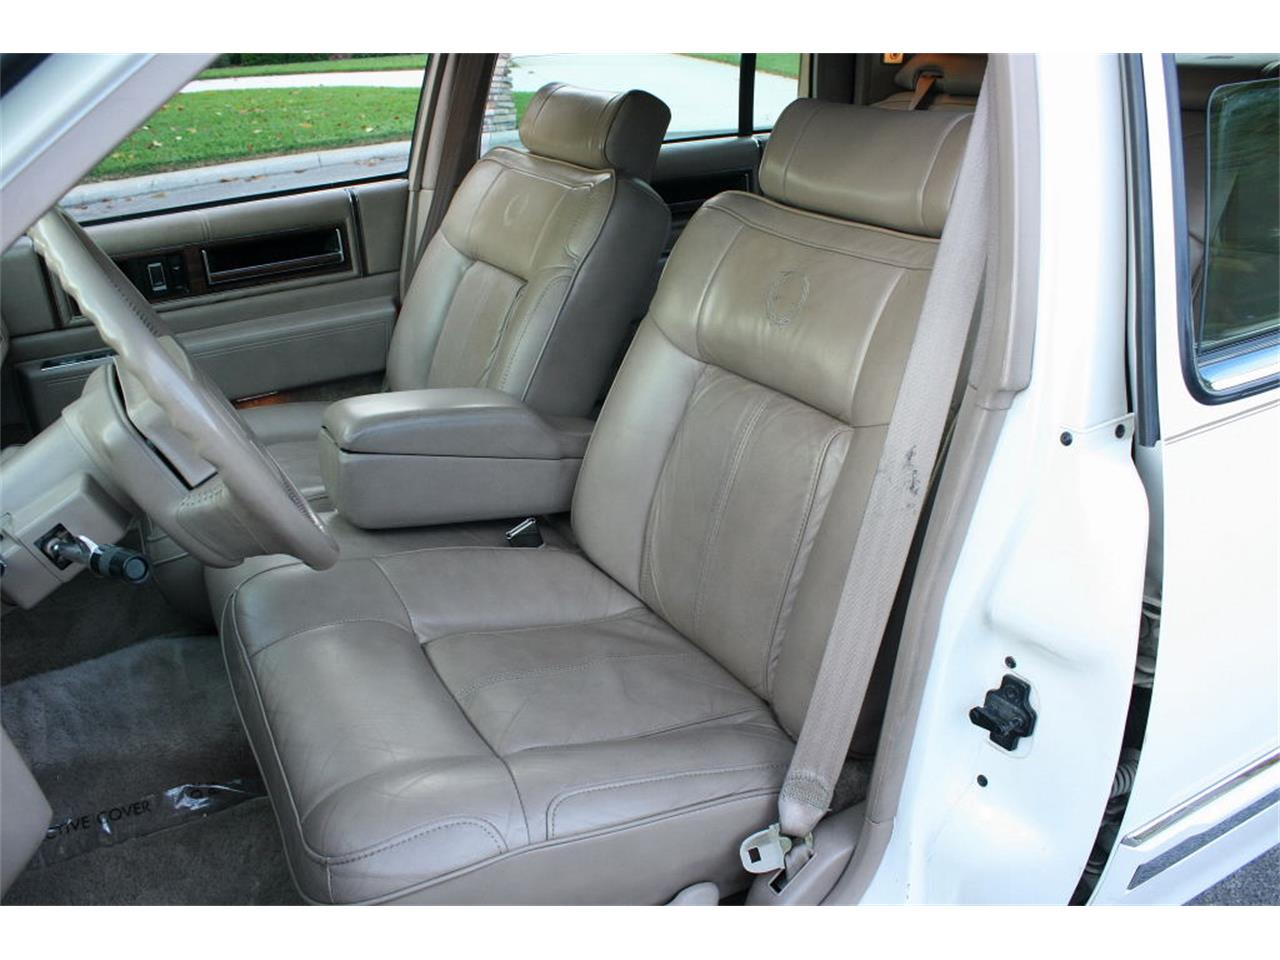 Large Picture of '91 Cadillac Sedan - $9,500.00 - L5XM